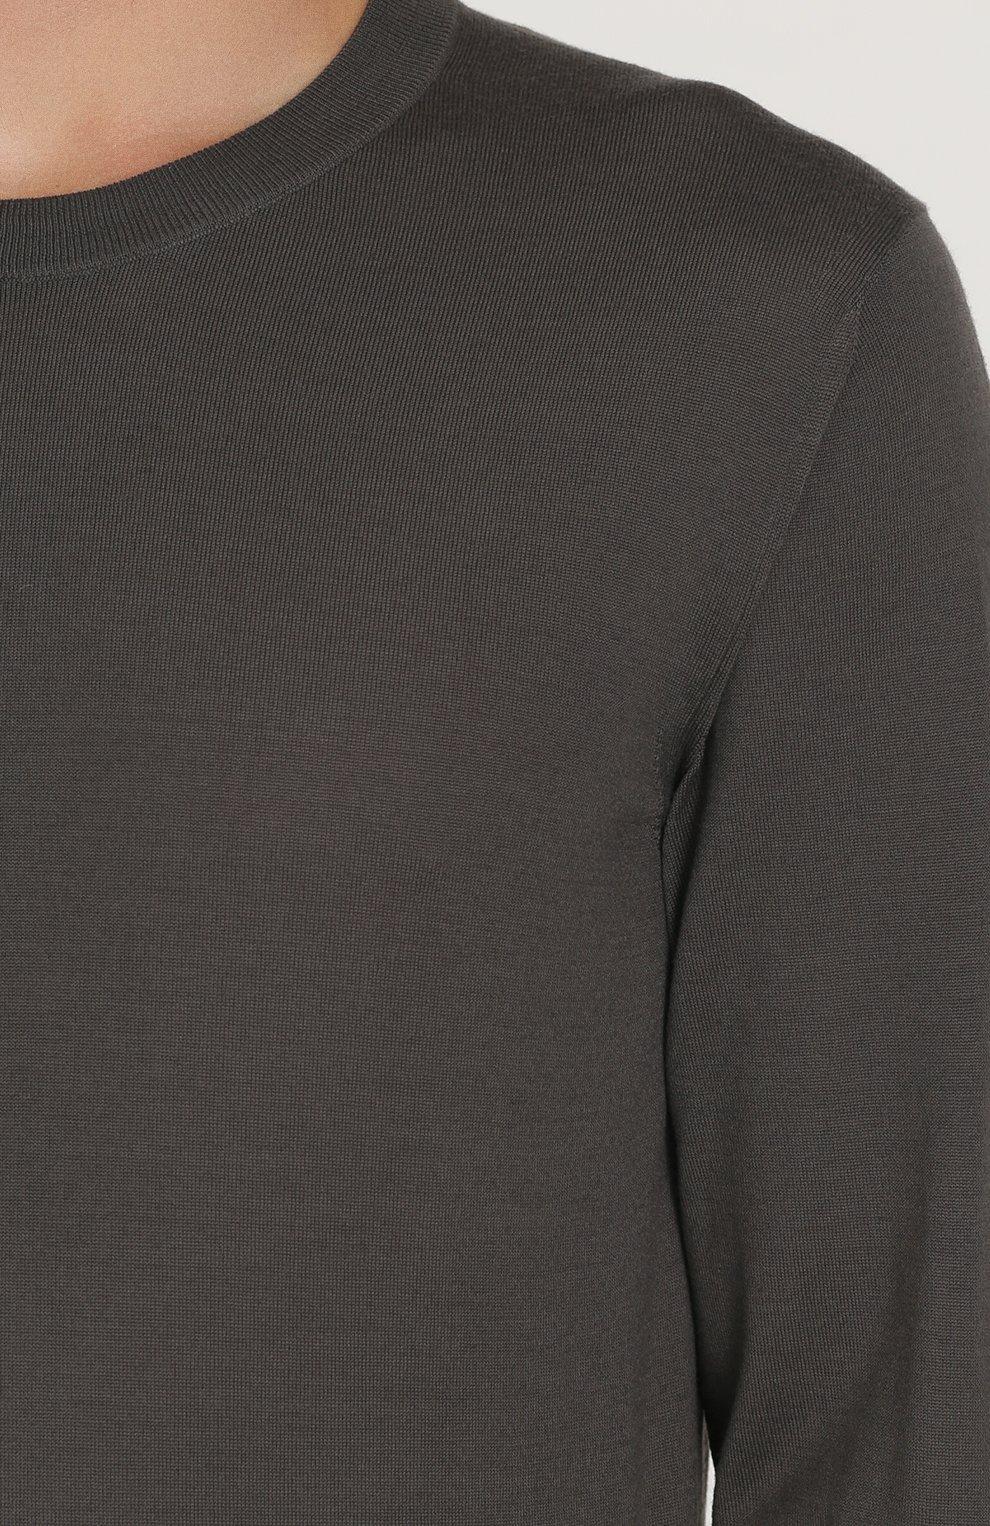 Джемпер из шерсти тонкой вязки Dolce & Gabbana темно-серый | Фото №5